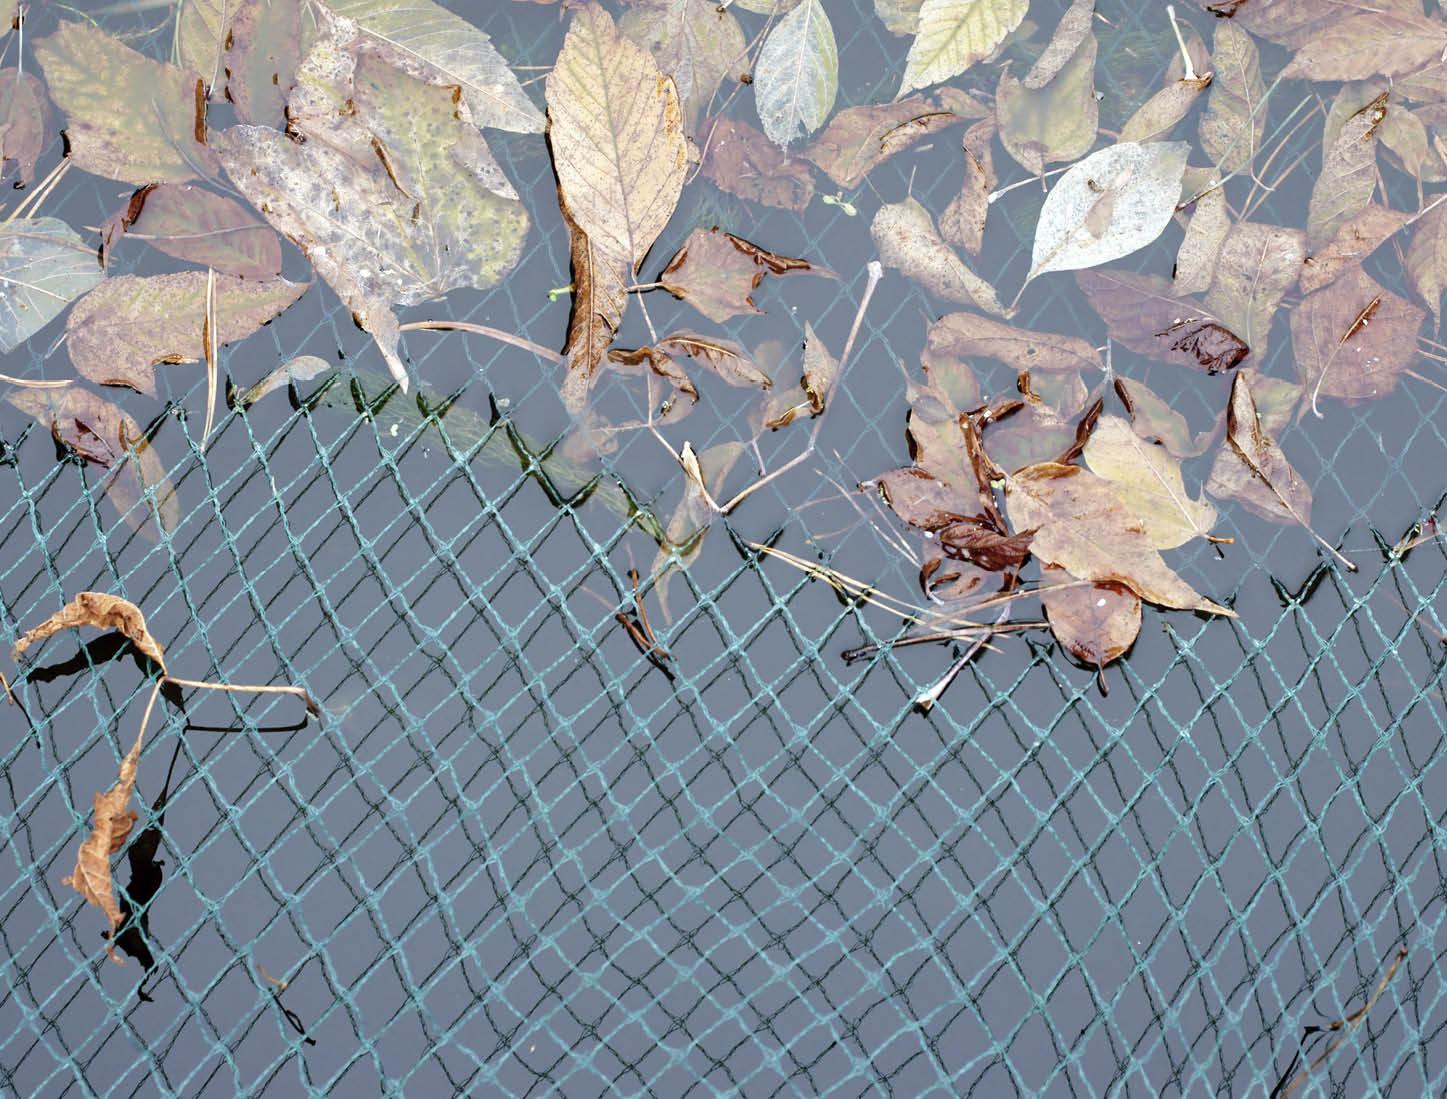 Autumn Pond Netting